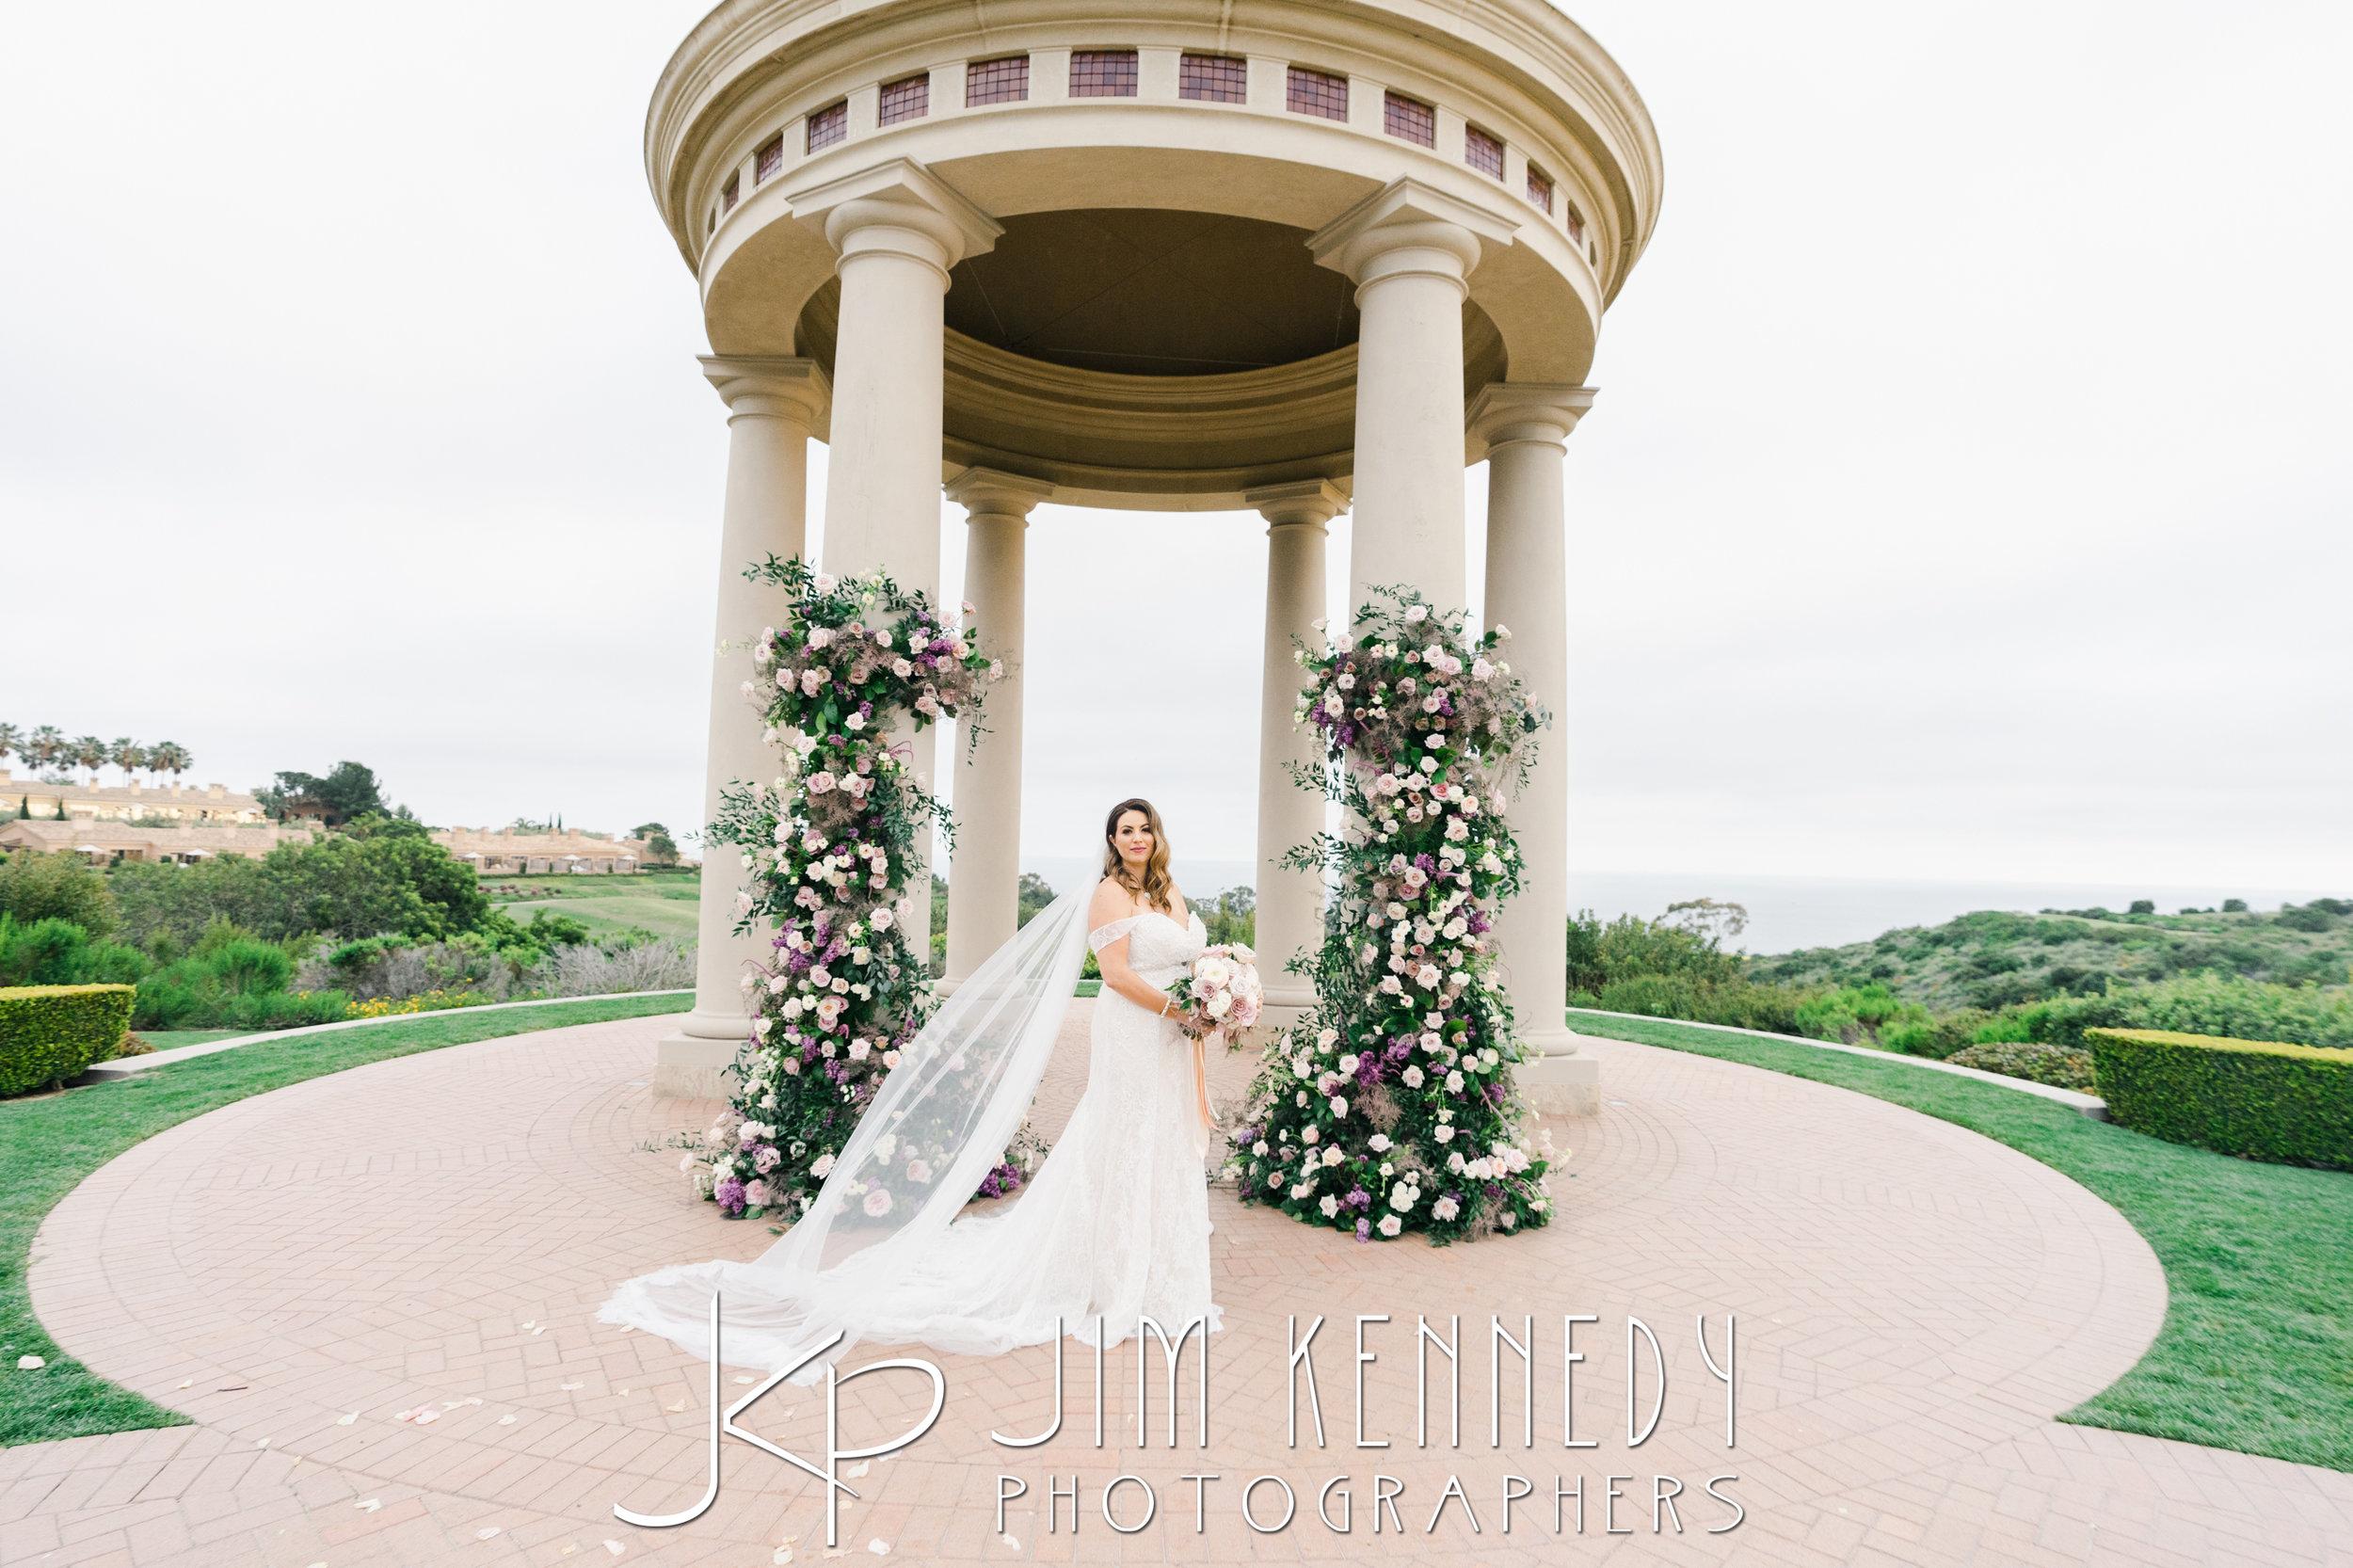 pelican-hill-wedding-jim-kenedy-photographers_0164.JPG